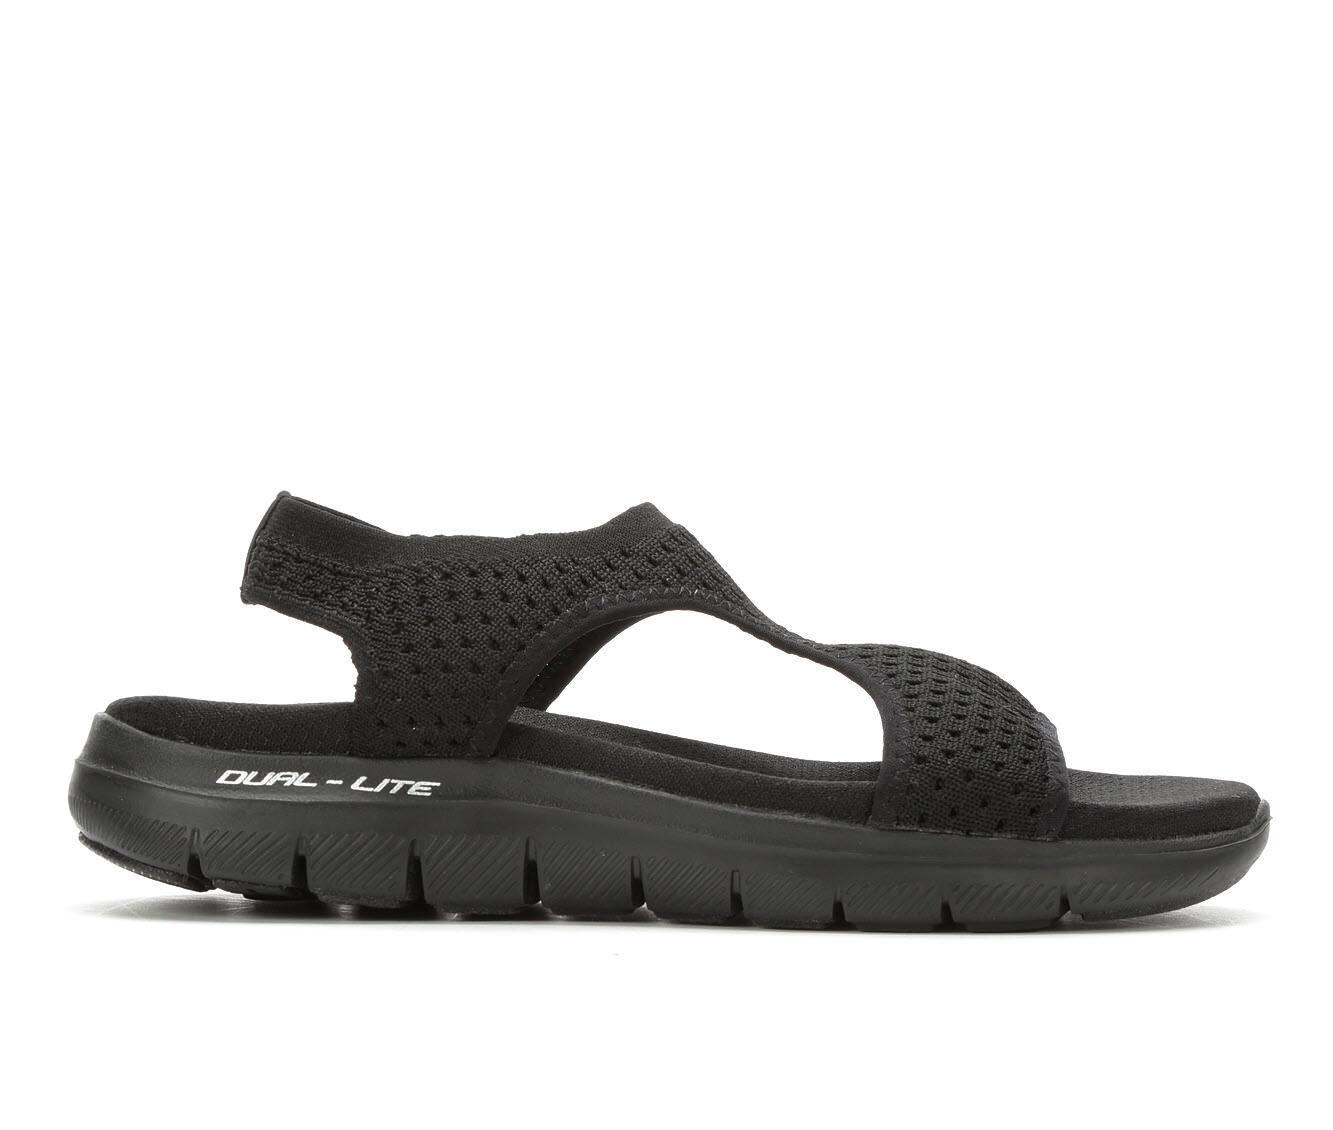 Women's Skechers Cali Flex Appeal Hiking Sandals Black